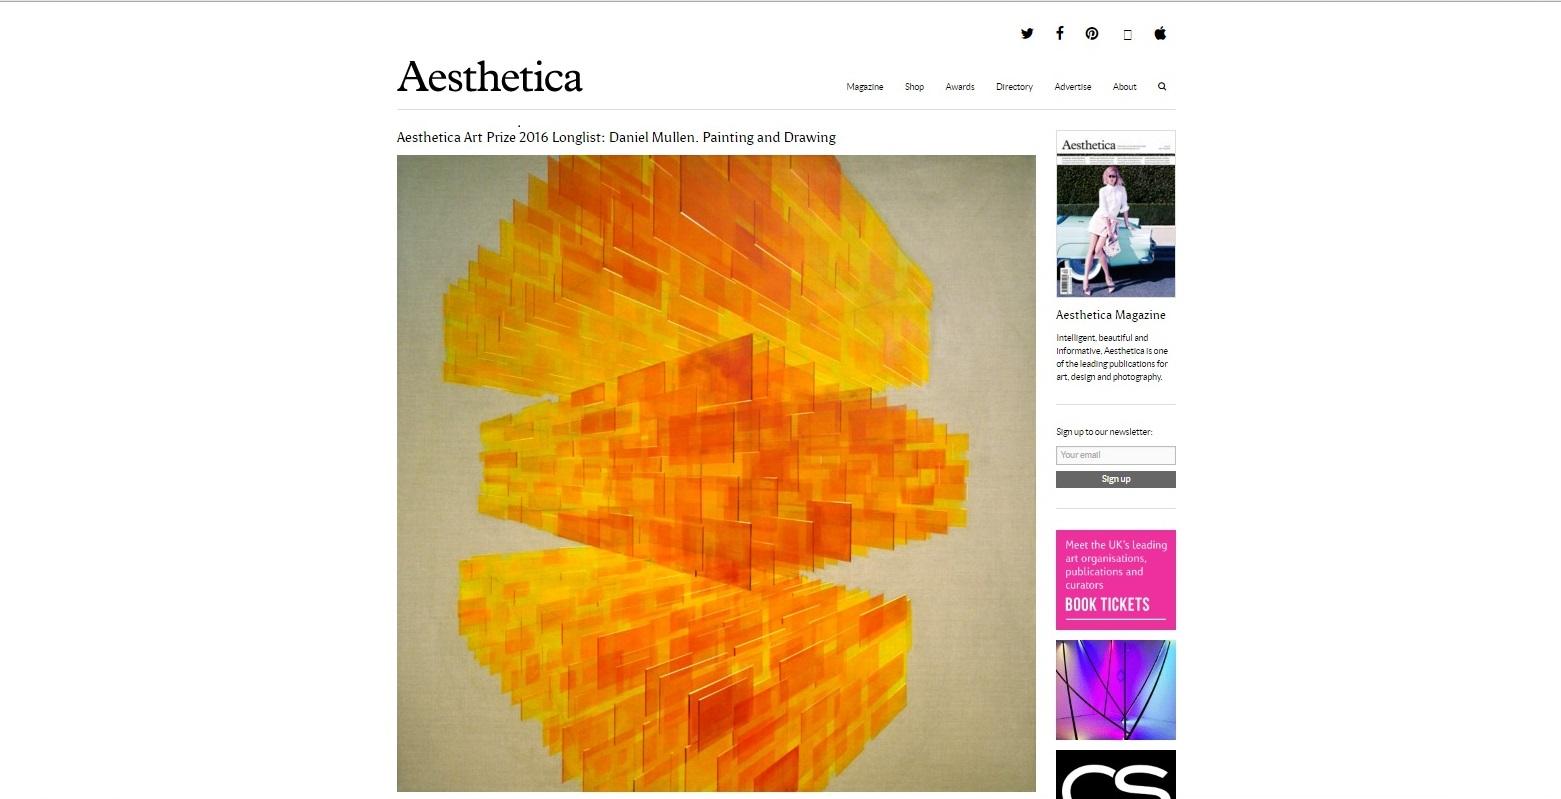 Aesthetica Art Prize